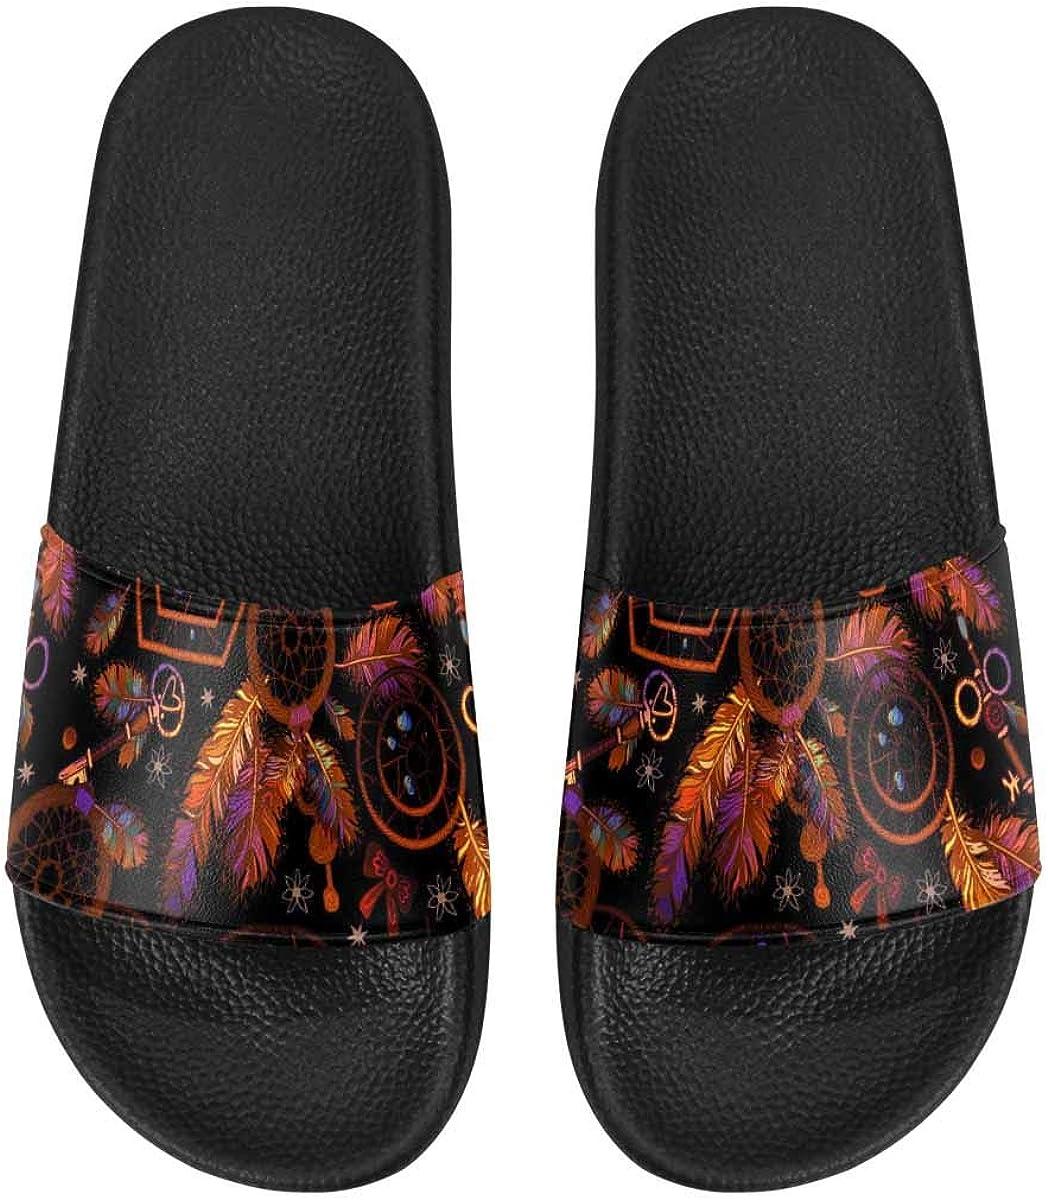 InterestPrint Women's Casual and Lightweight Slipper Sandals for Outside Dream Catcher Color Dot